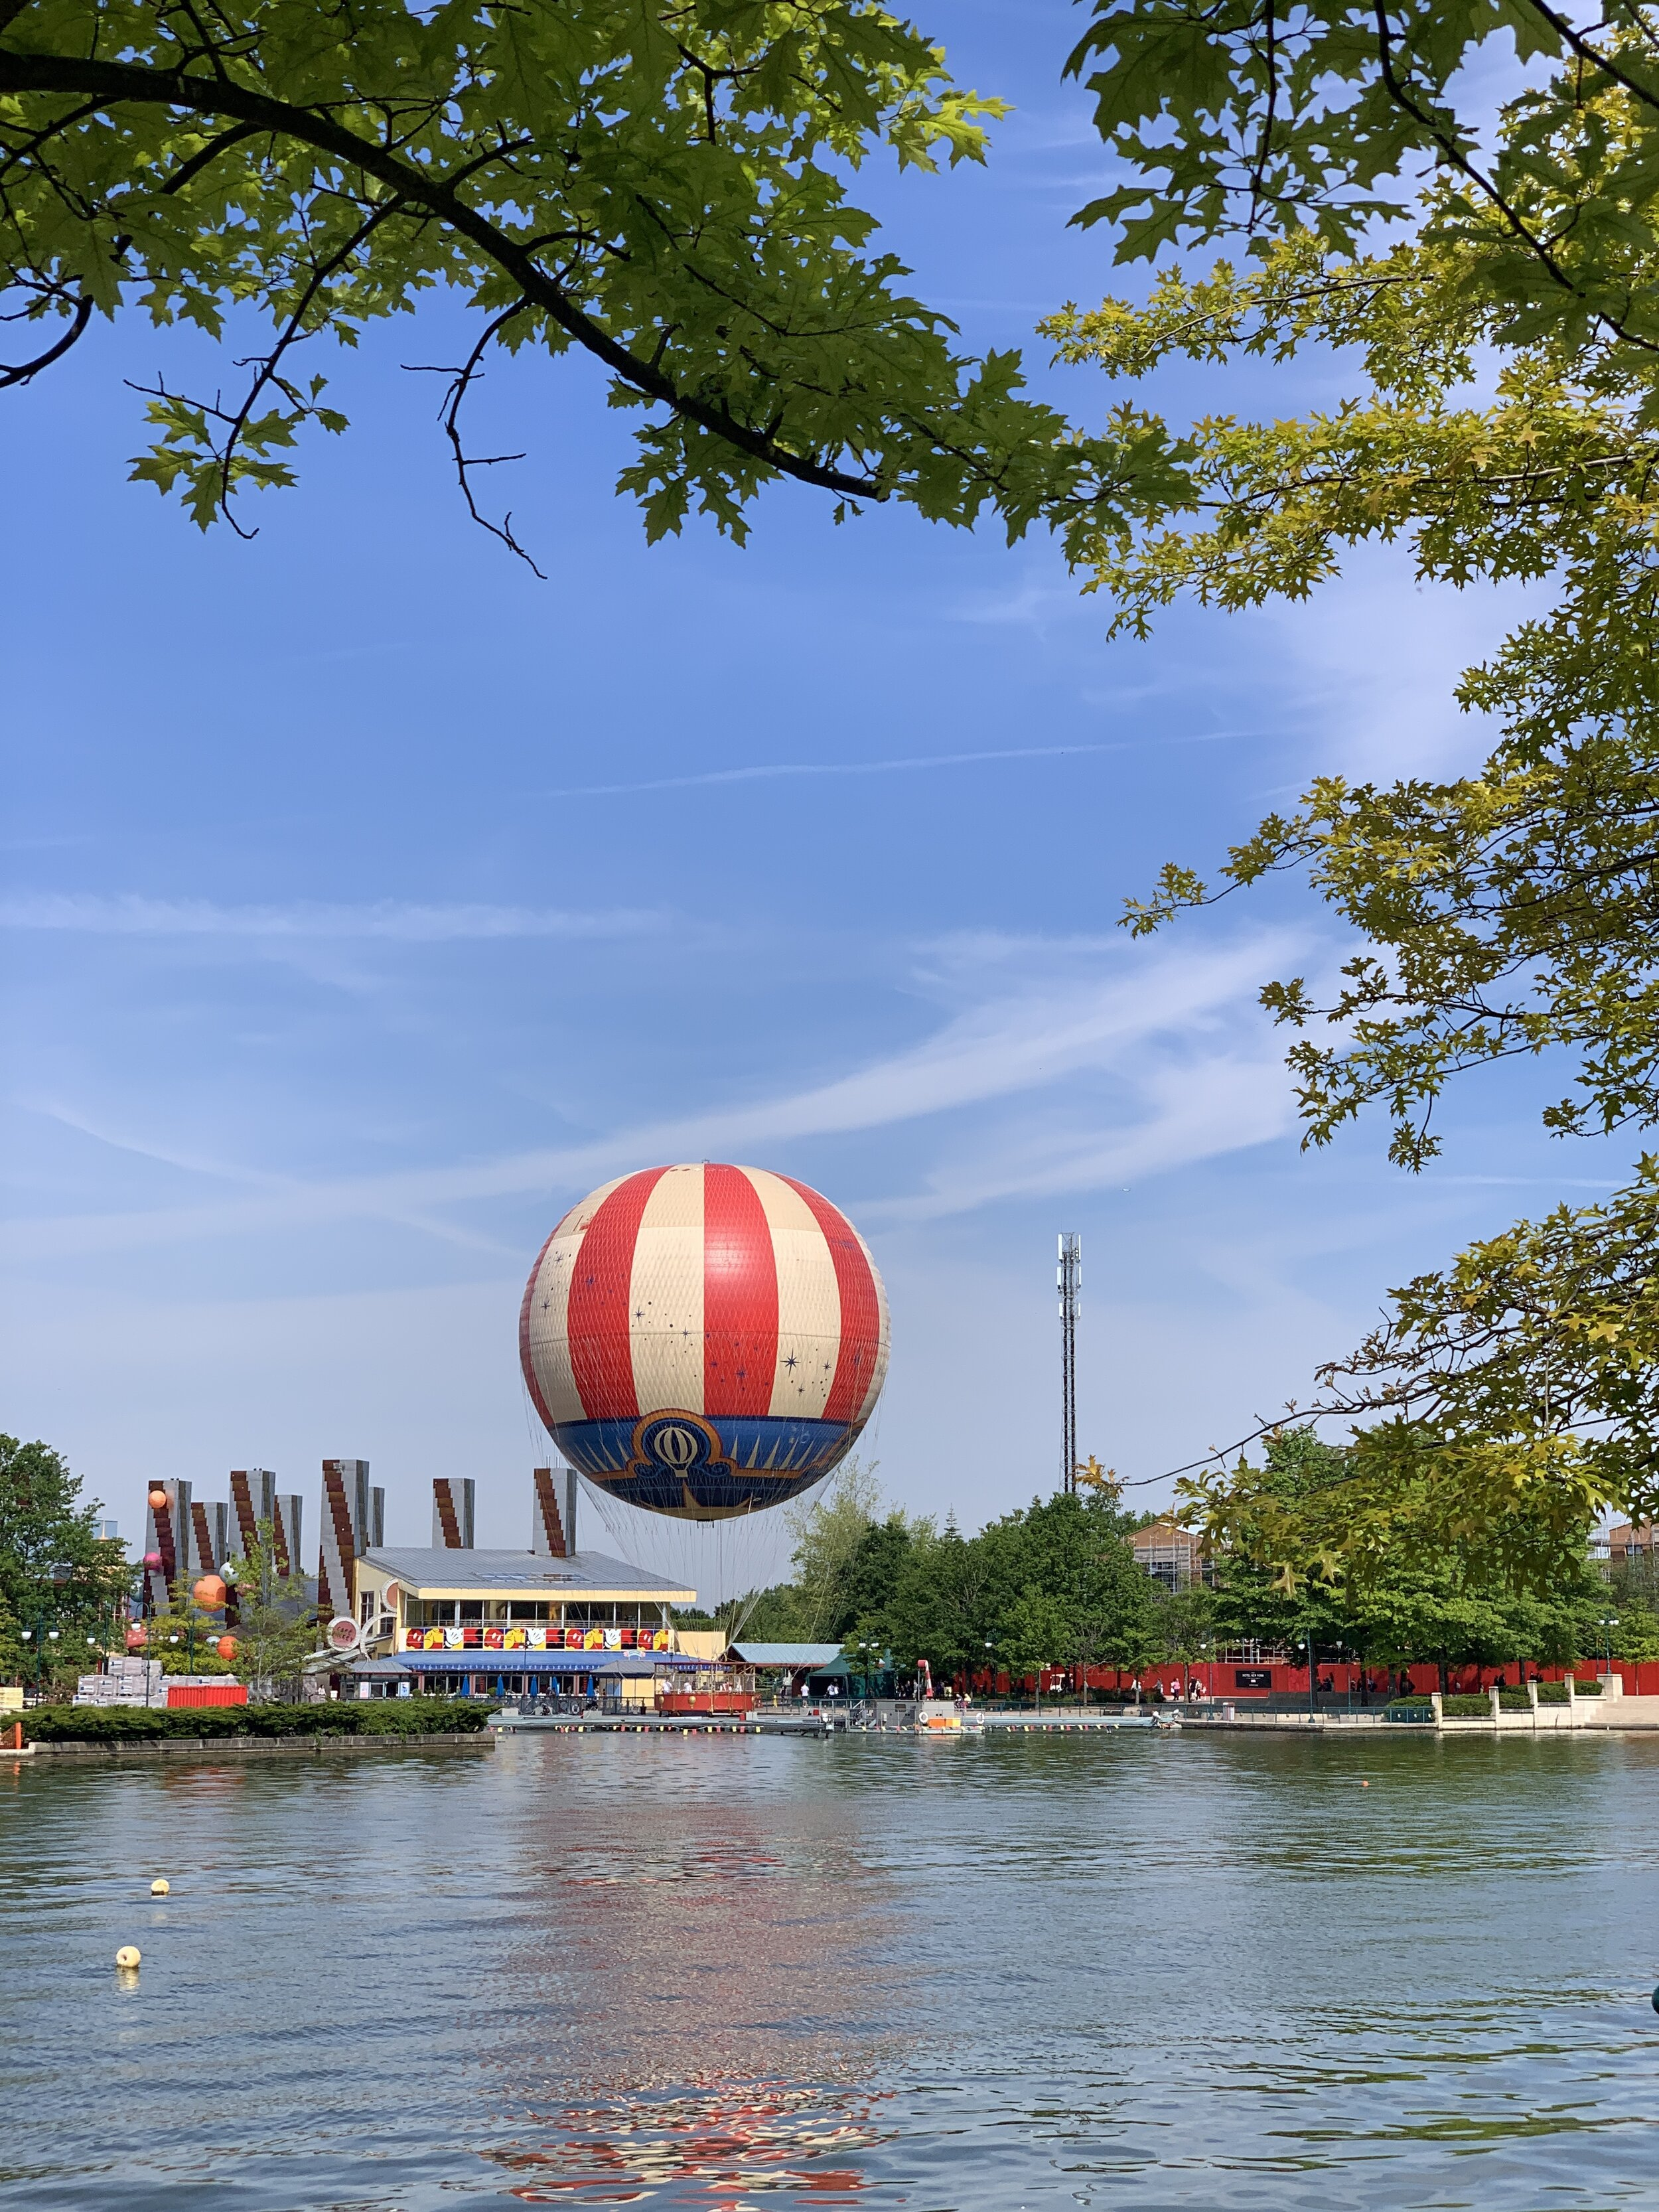 Disney Village has the original Disney balloon!